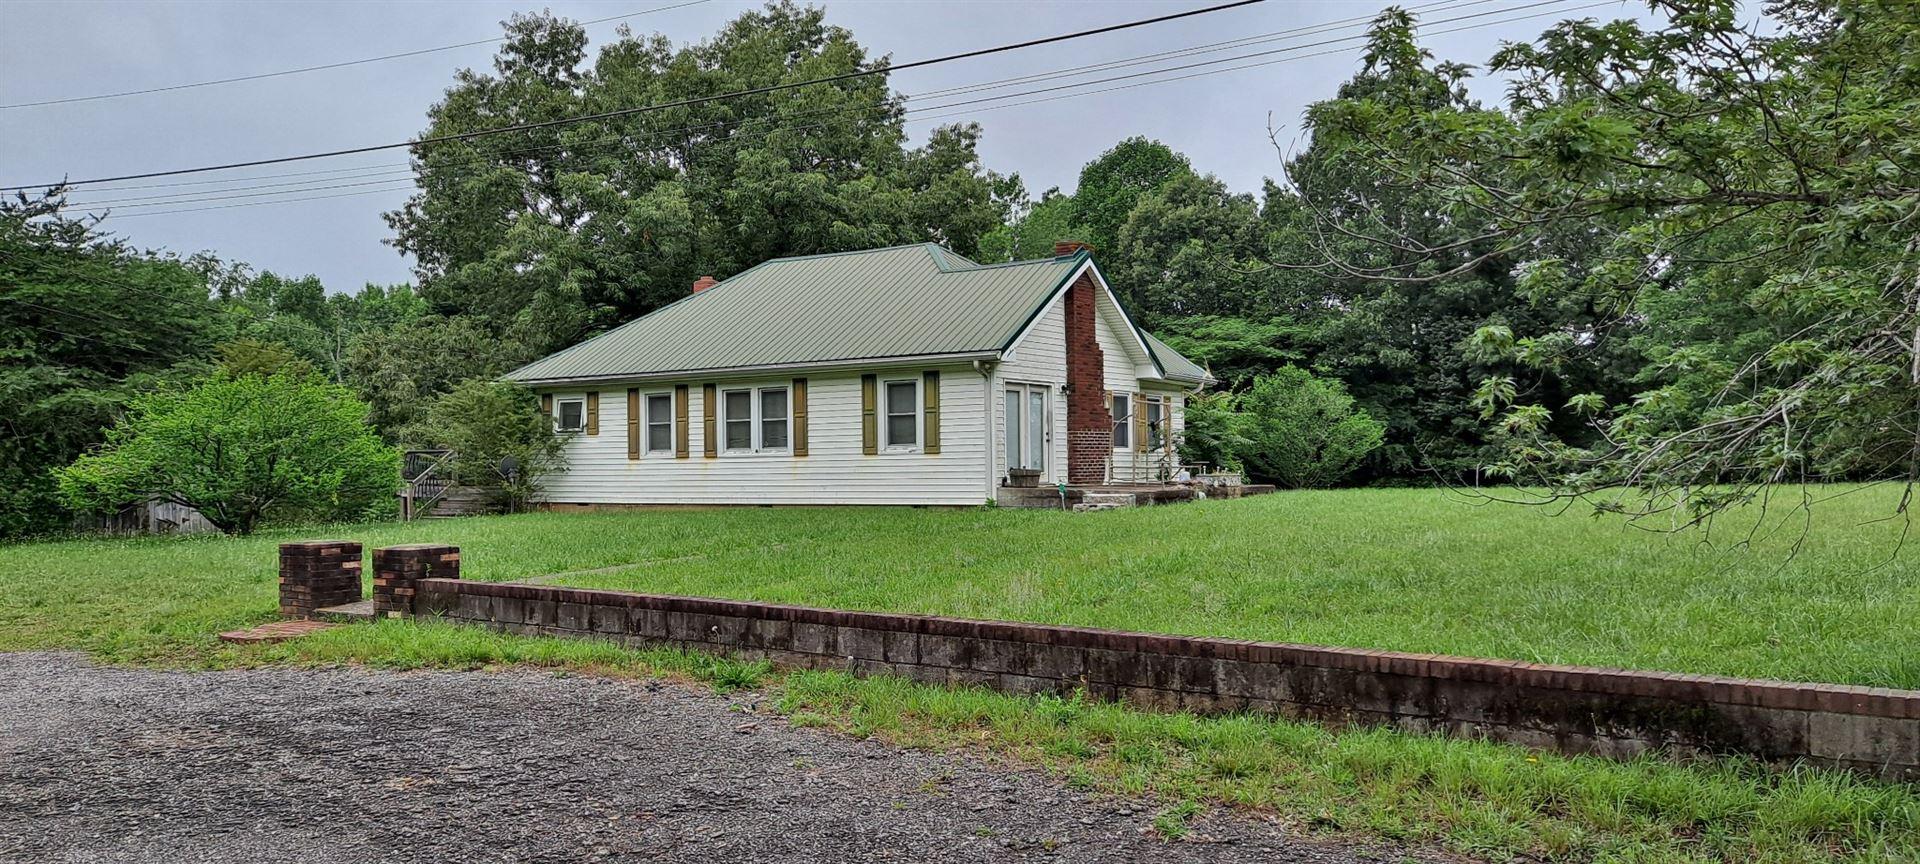 760 Tracy Ln, Clarksville, TN 37040 - MLS#: 2261163